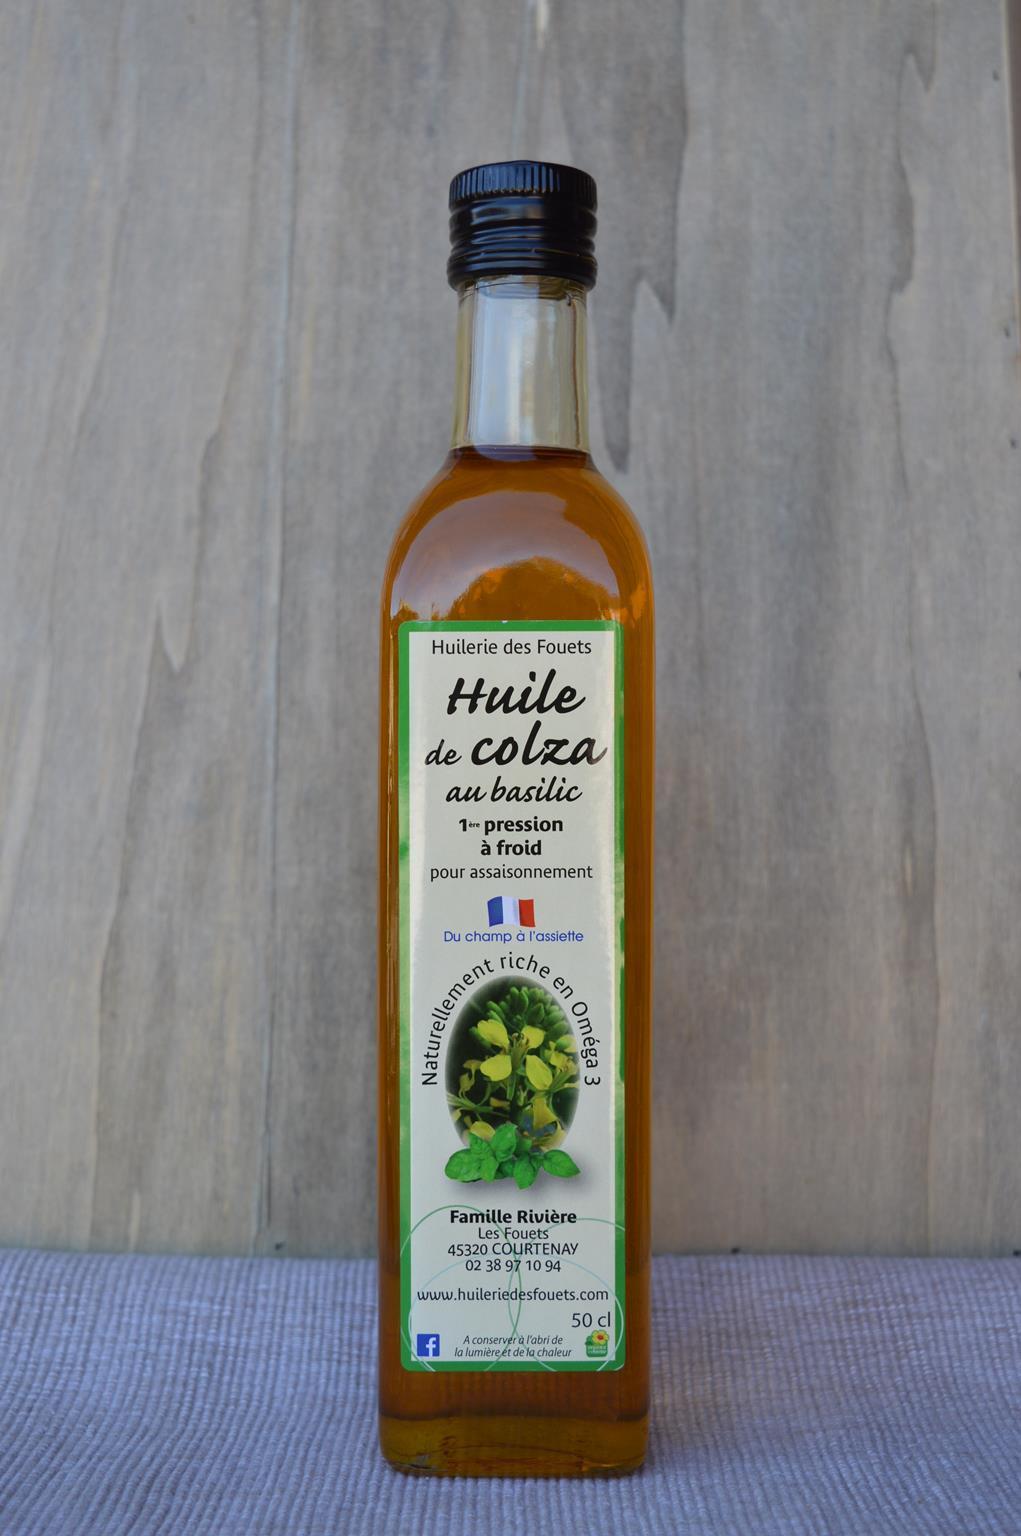 Huile colza basilic premiere pression froid 50cl huilerie des fouets copy